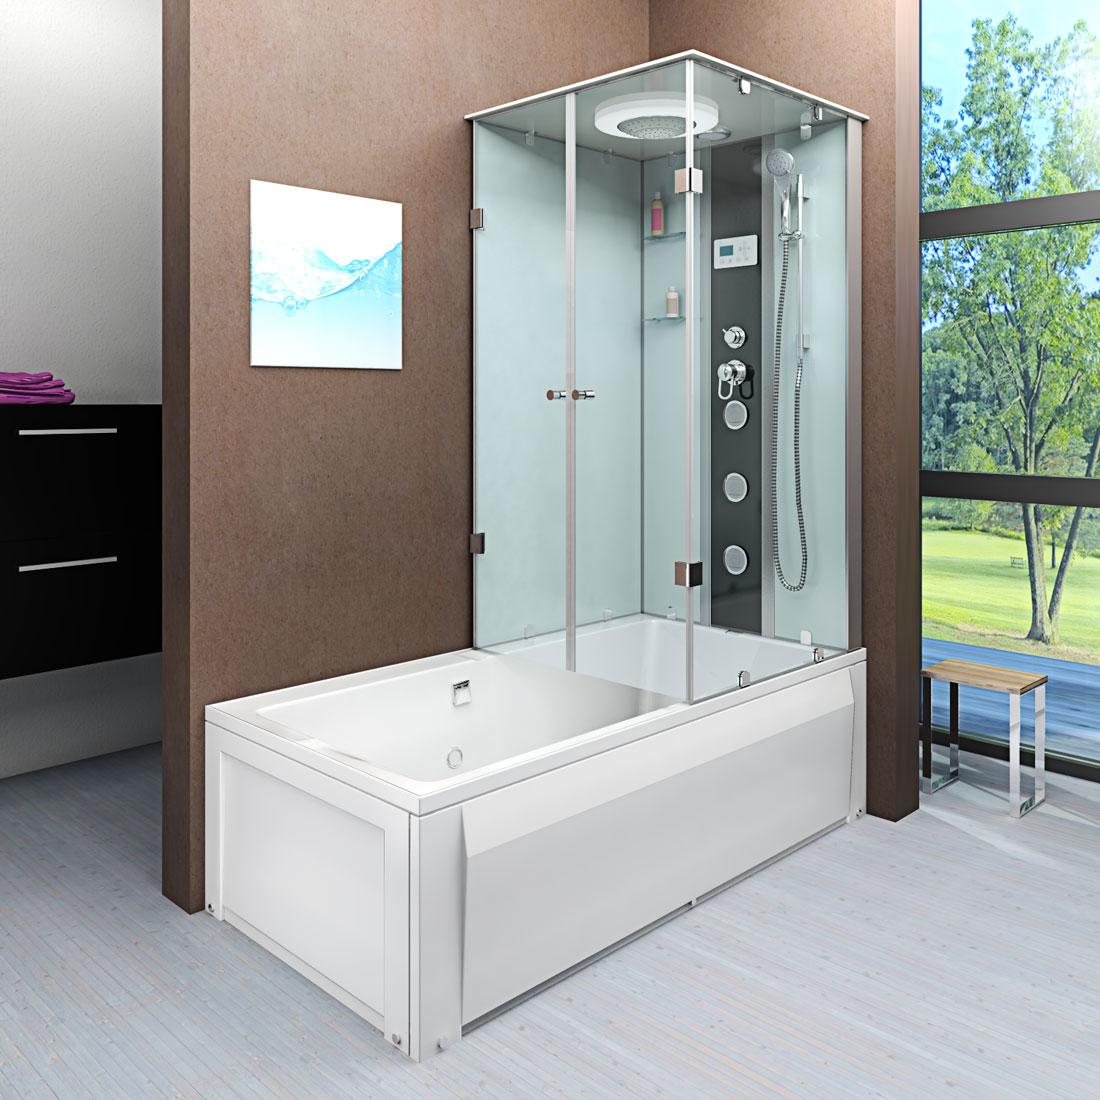 Badewanne Dusche Kombi